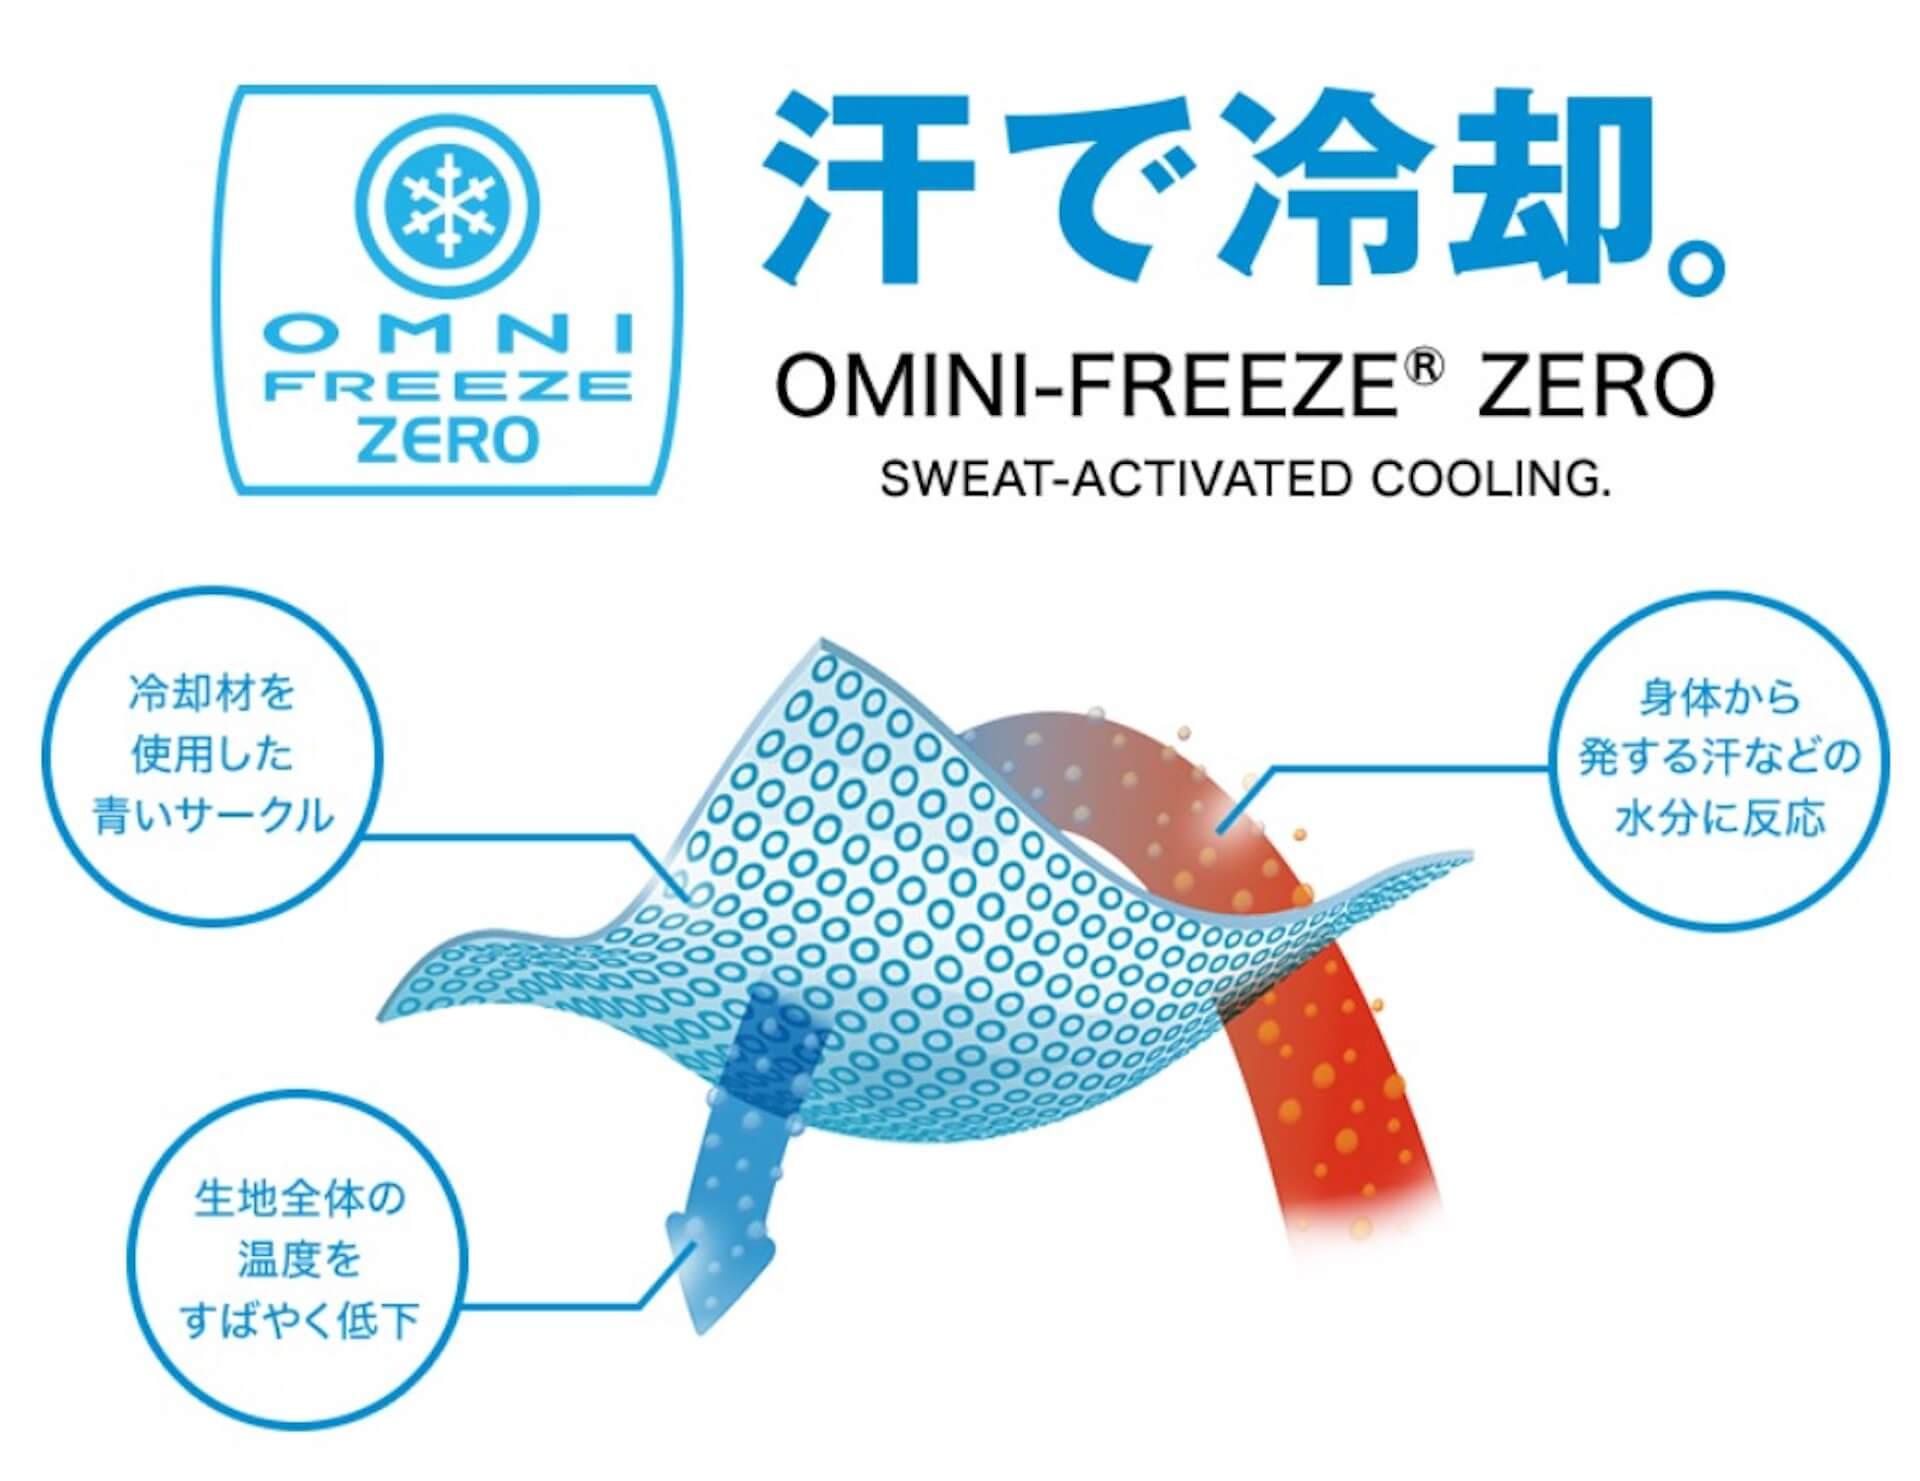 Columbiaからマスクがわりにも最適なネックガード2種が発売決定!汗が冷却効果をもたらす「オムニフリーズゼロ」搭載 life200721_columbia_mask_3